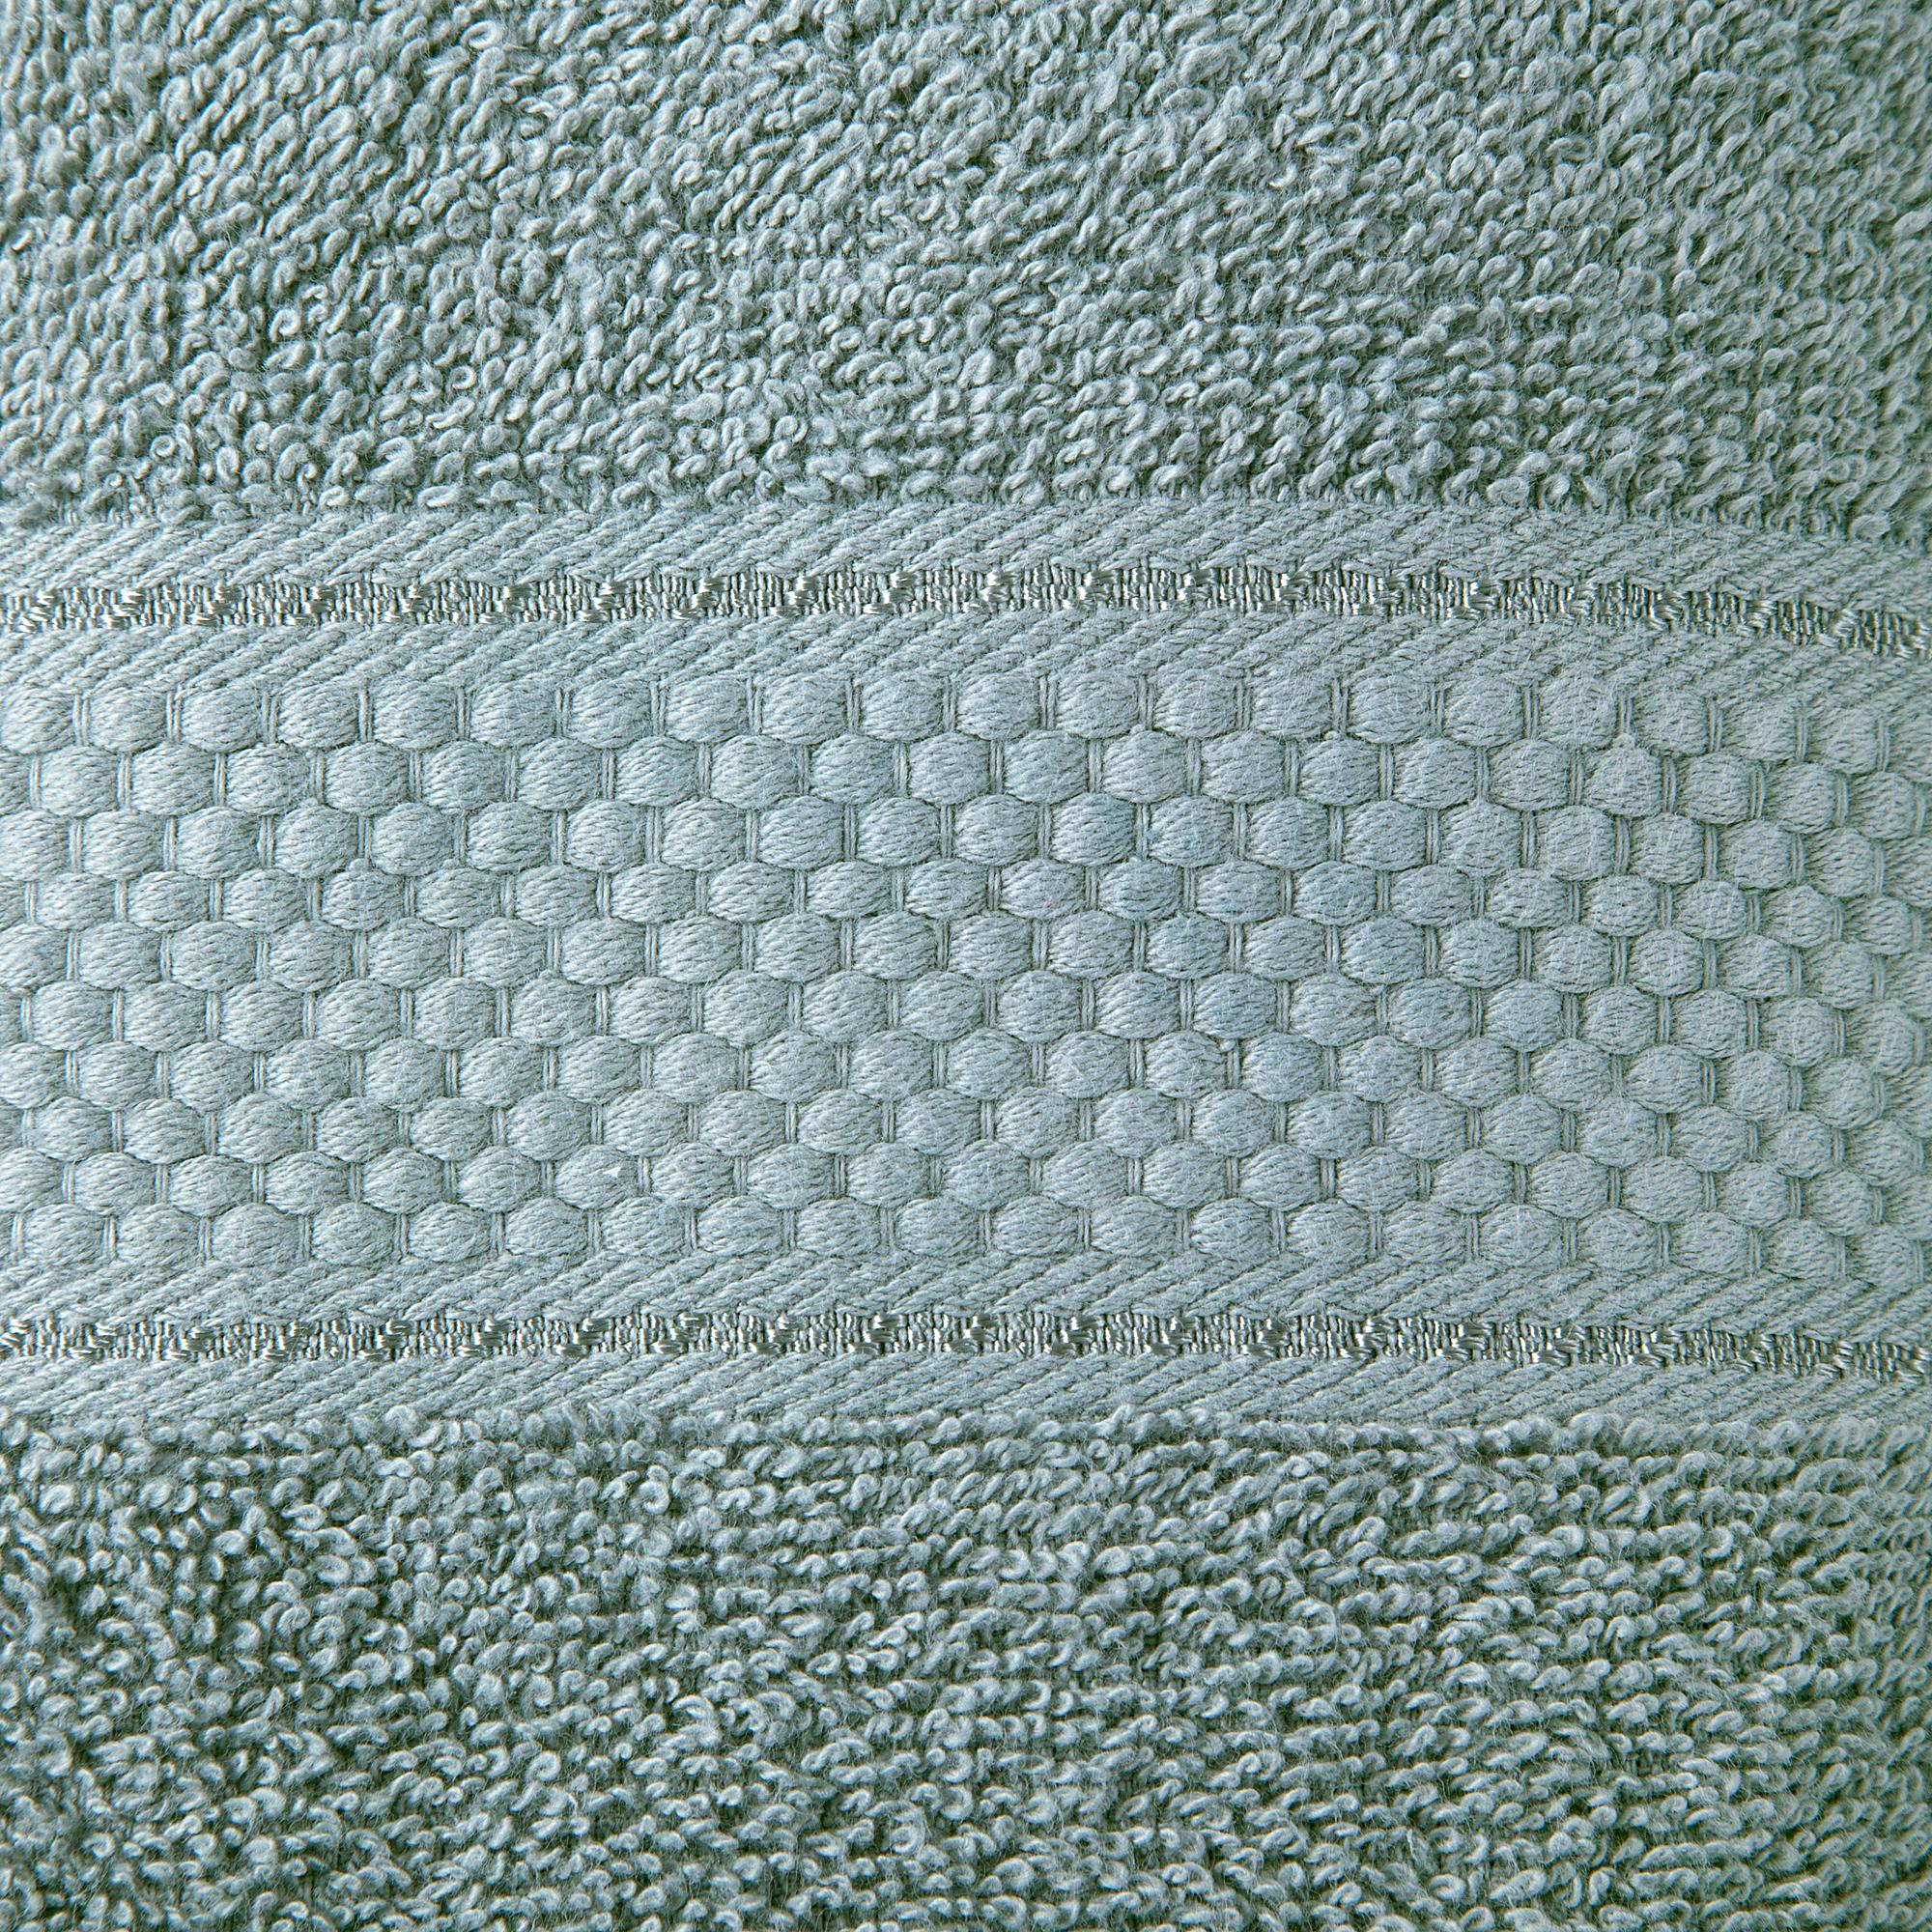 2 Pcs 100 % Cotton Premium Bath Sheet Towel Bale Set Silver Plain